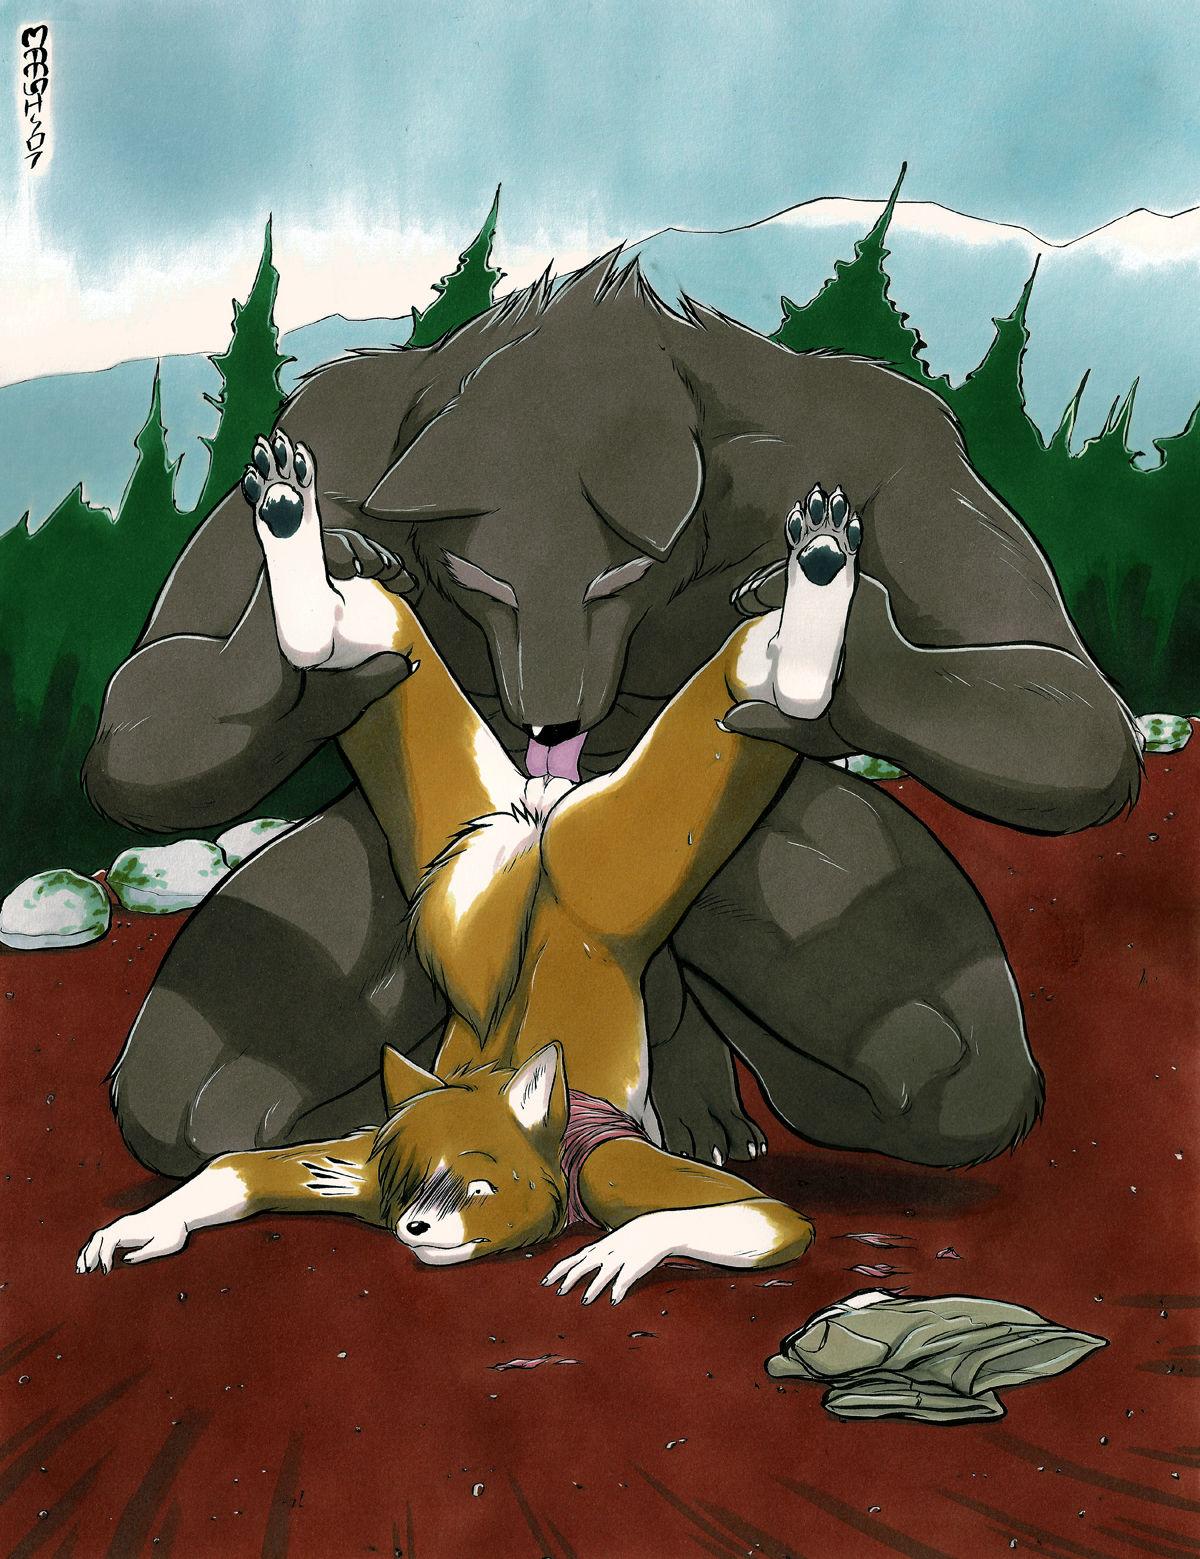 Free anime werewolves porn videos hentai videos